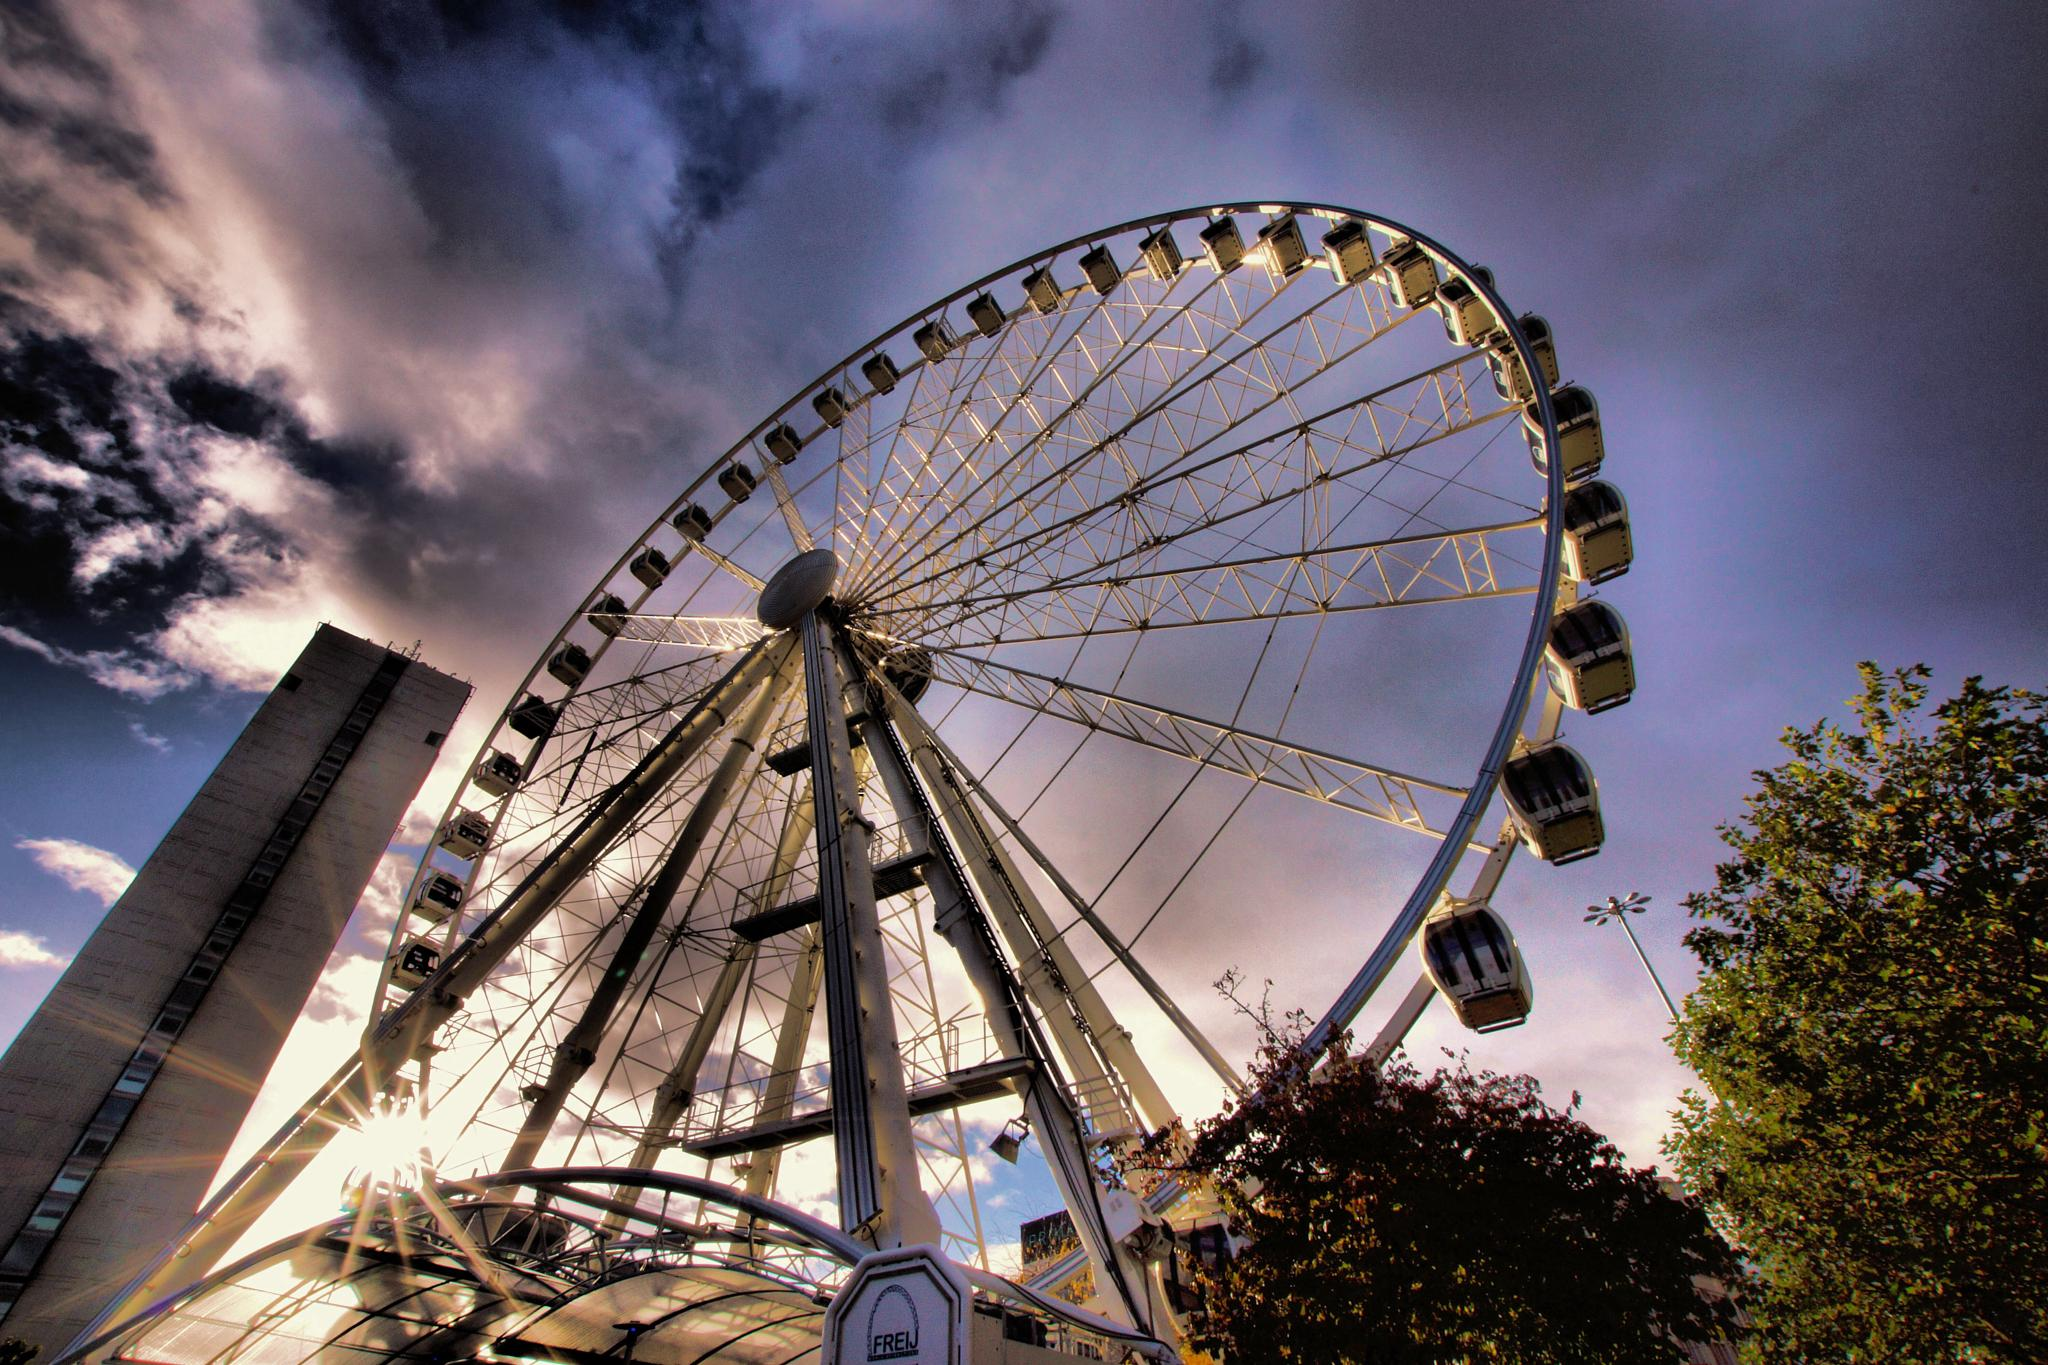 Big Wheel, Manchester. by john.bradburn